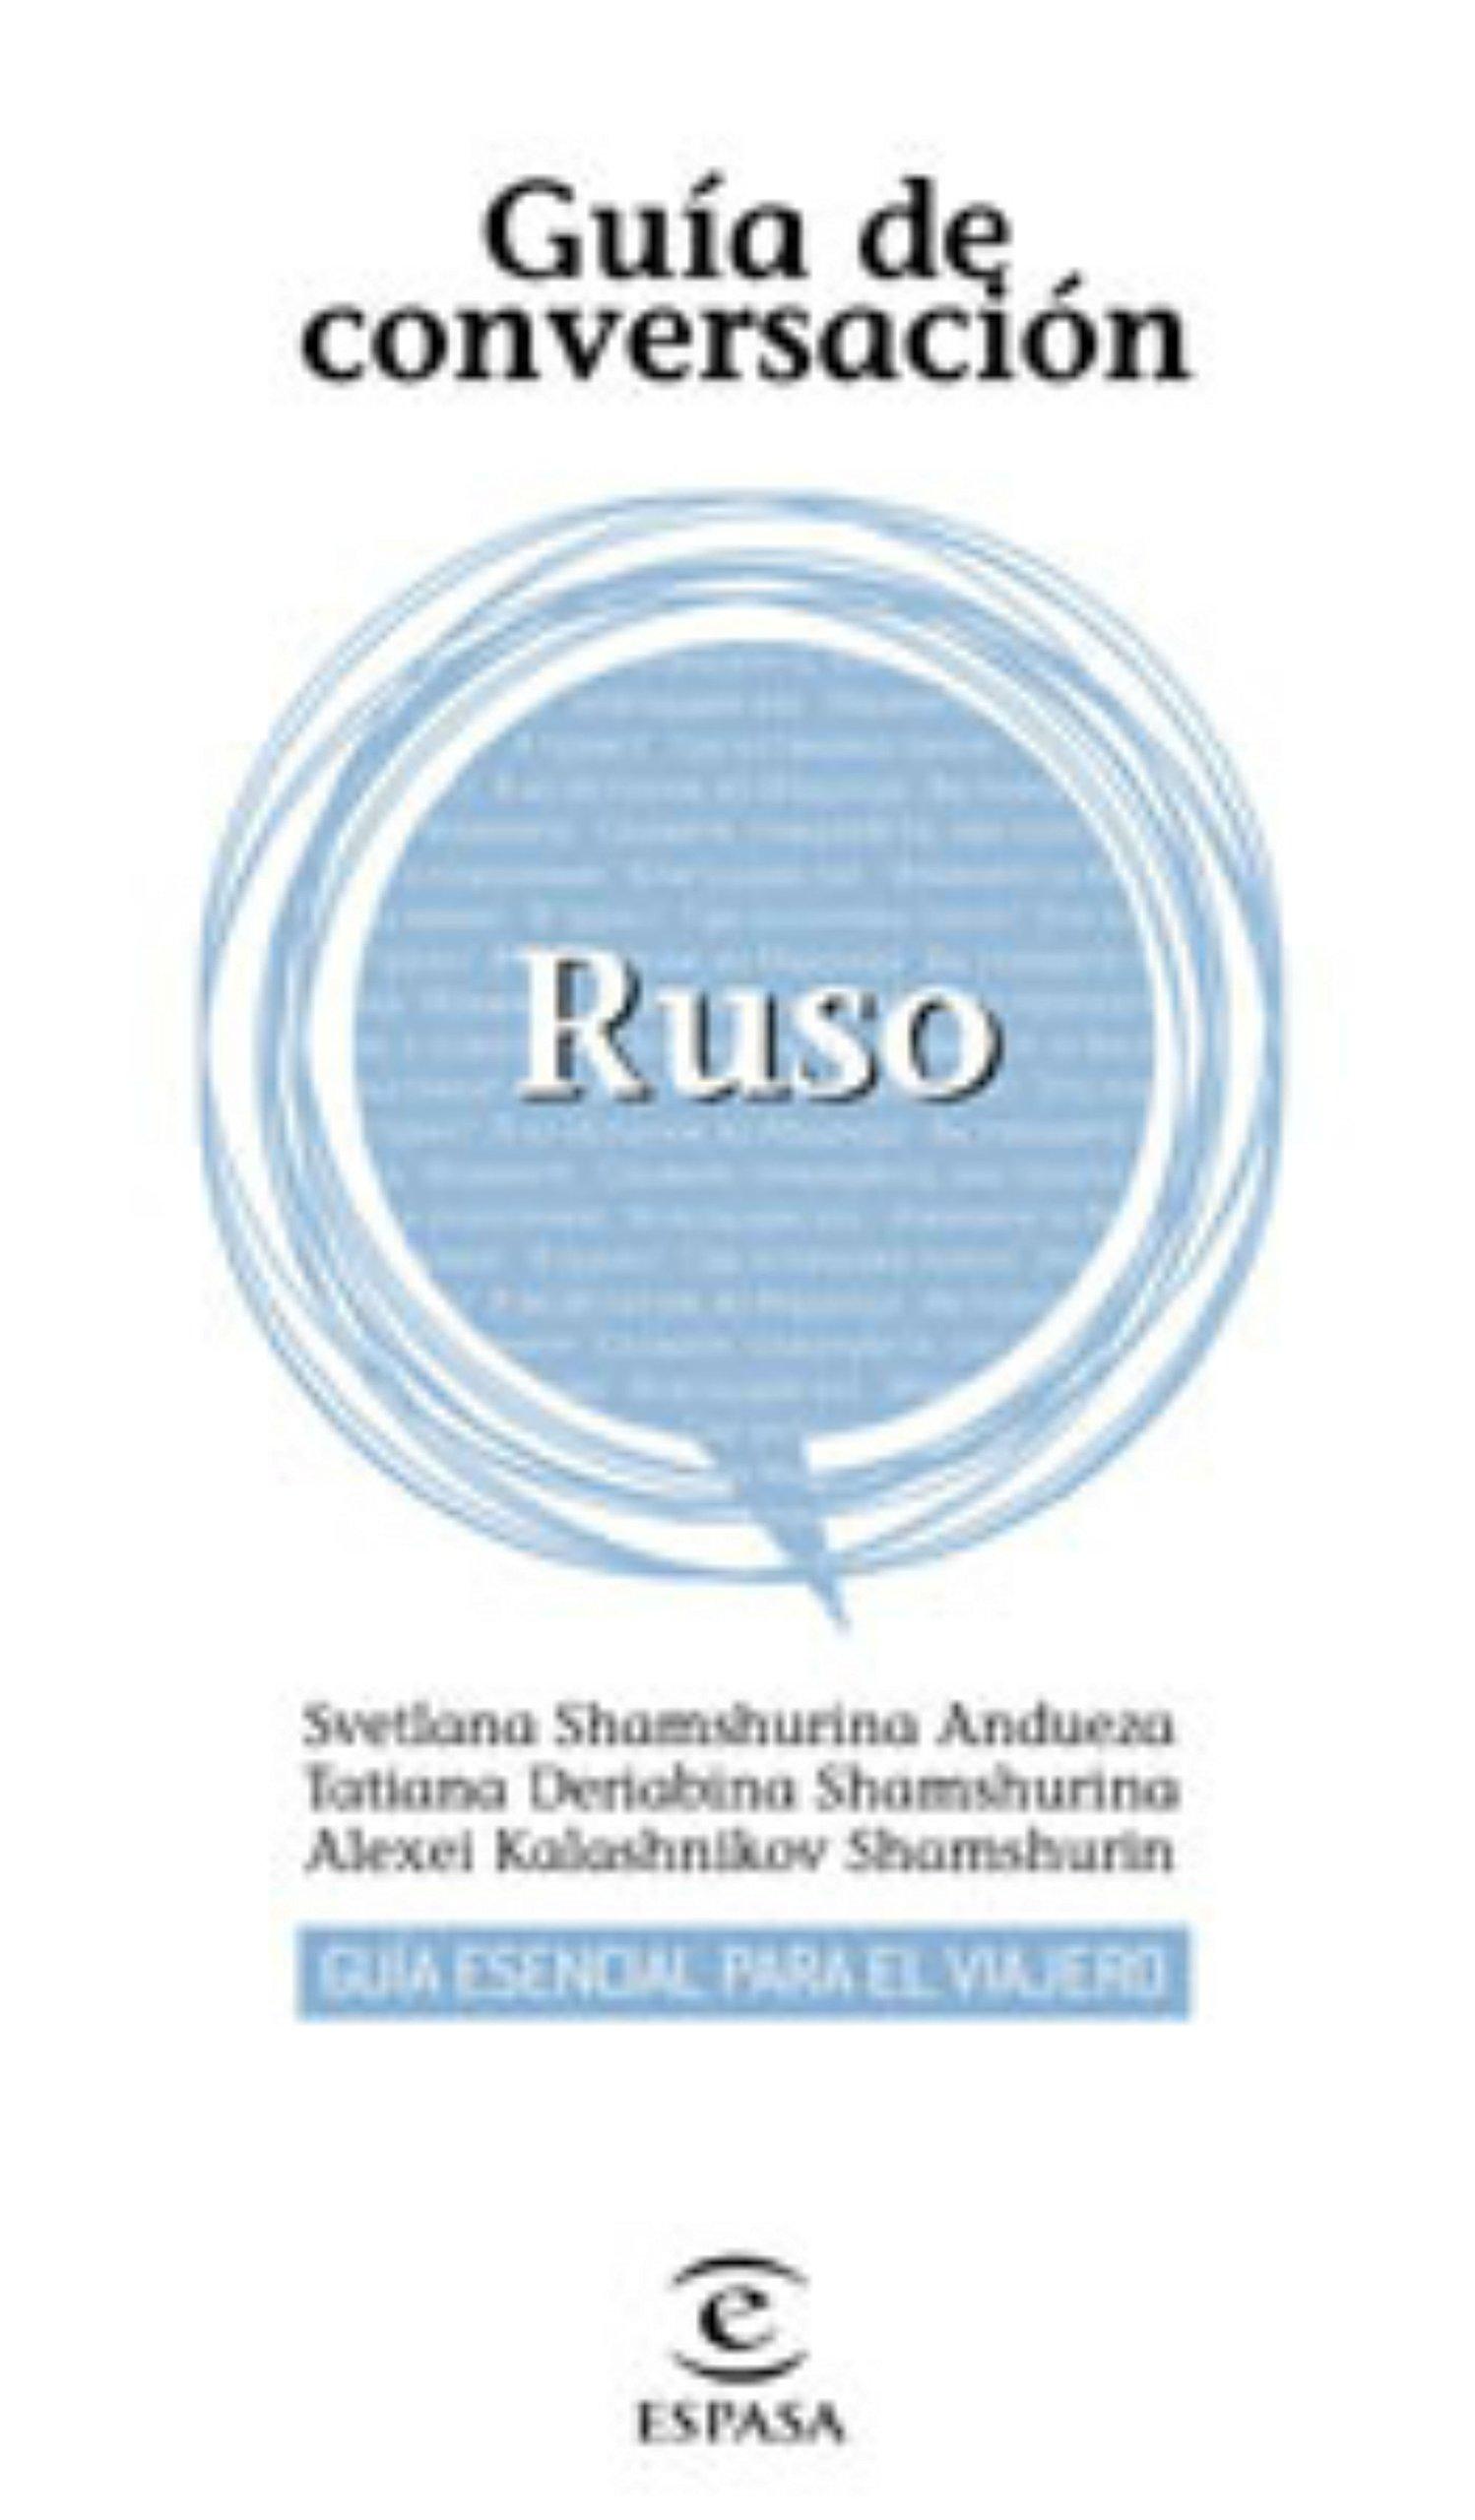 Guía de conversación ruso (Spanish) Paperback – January 1, 1900